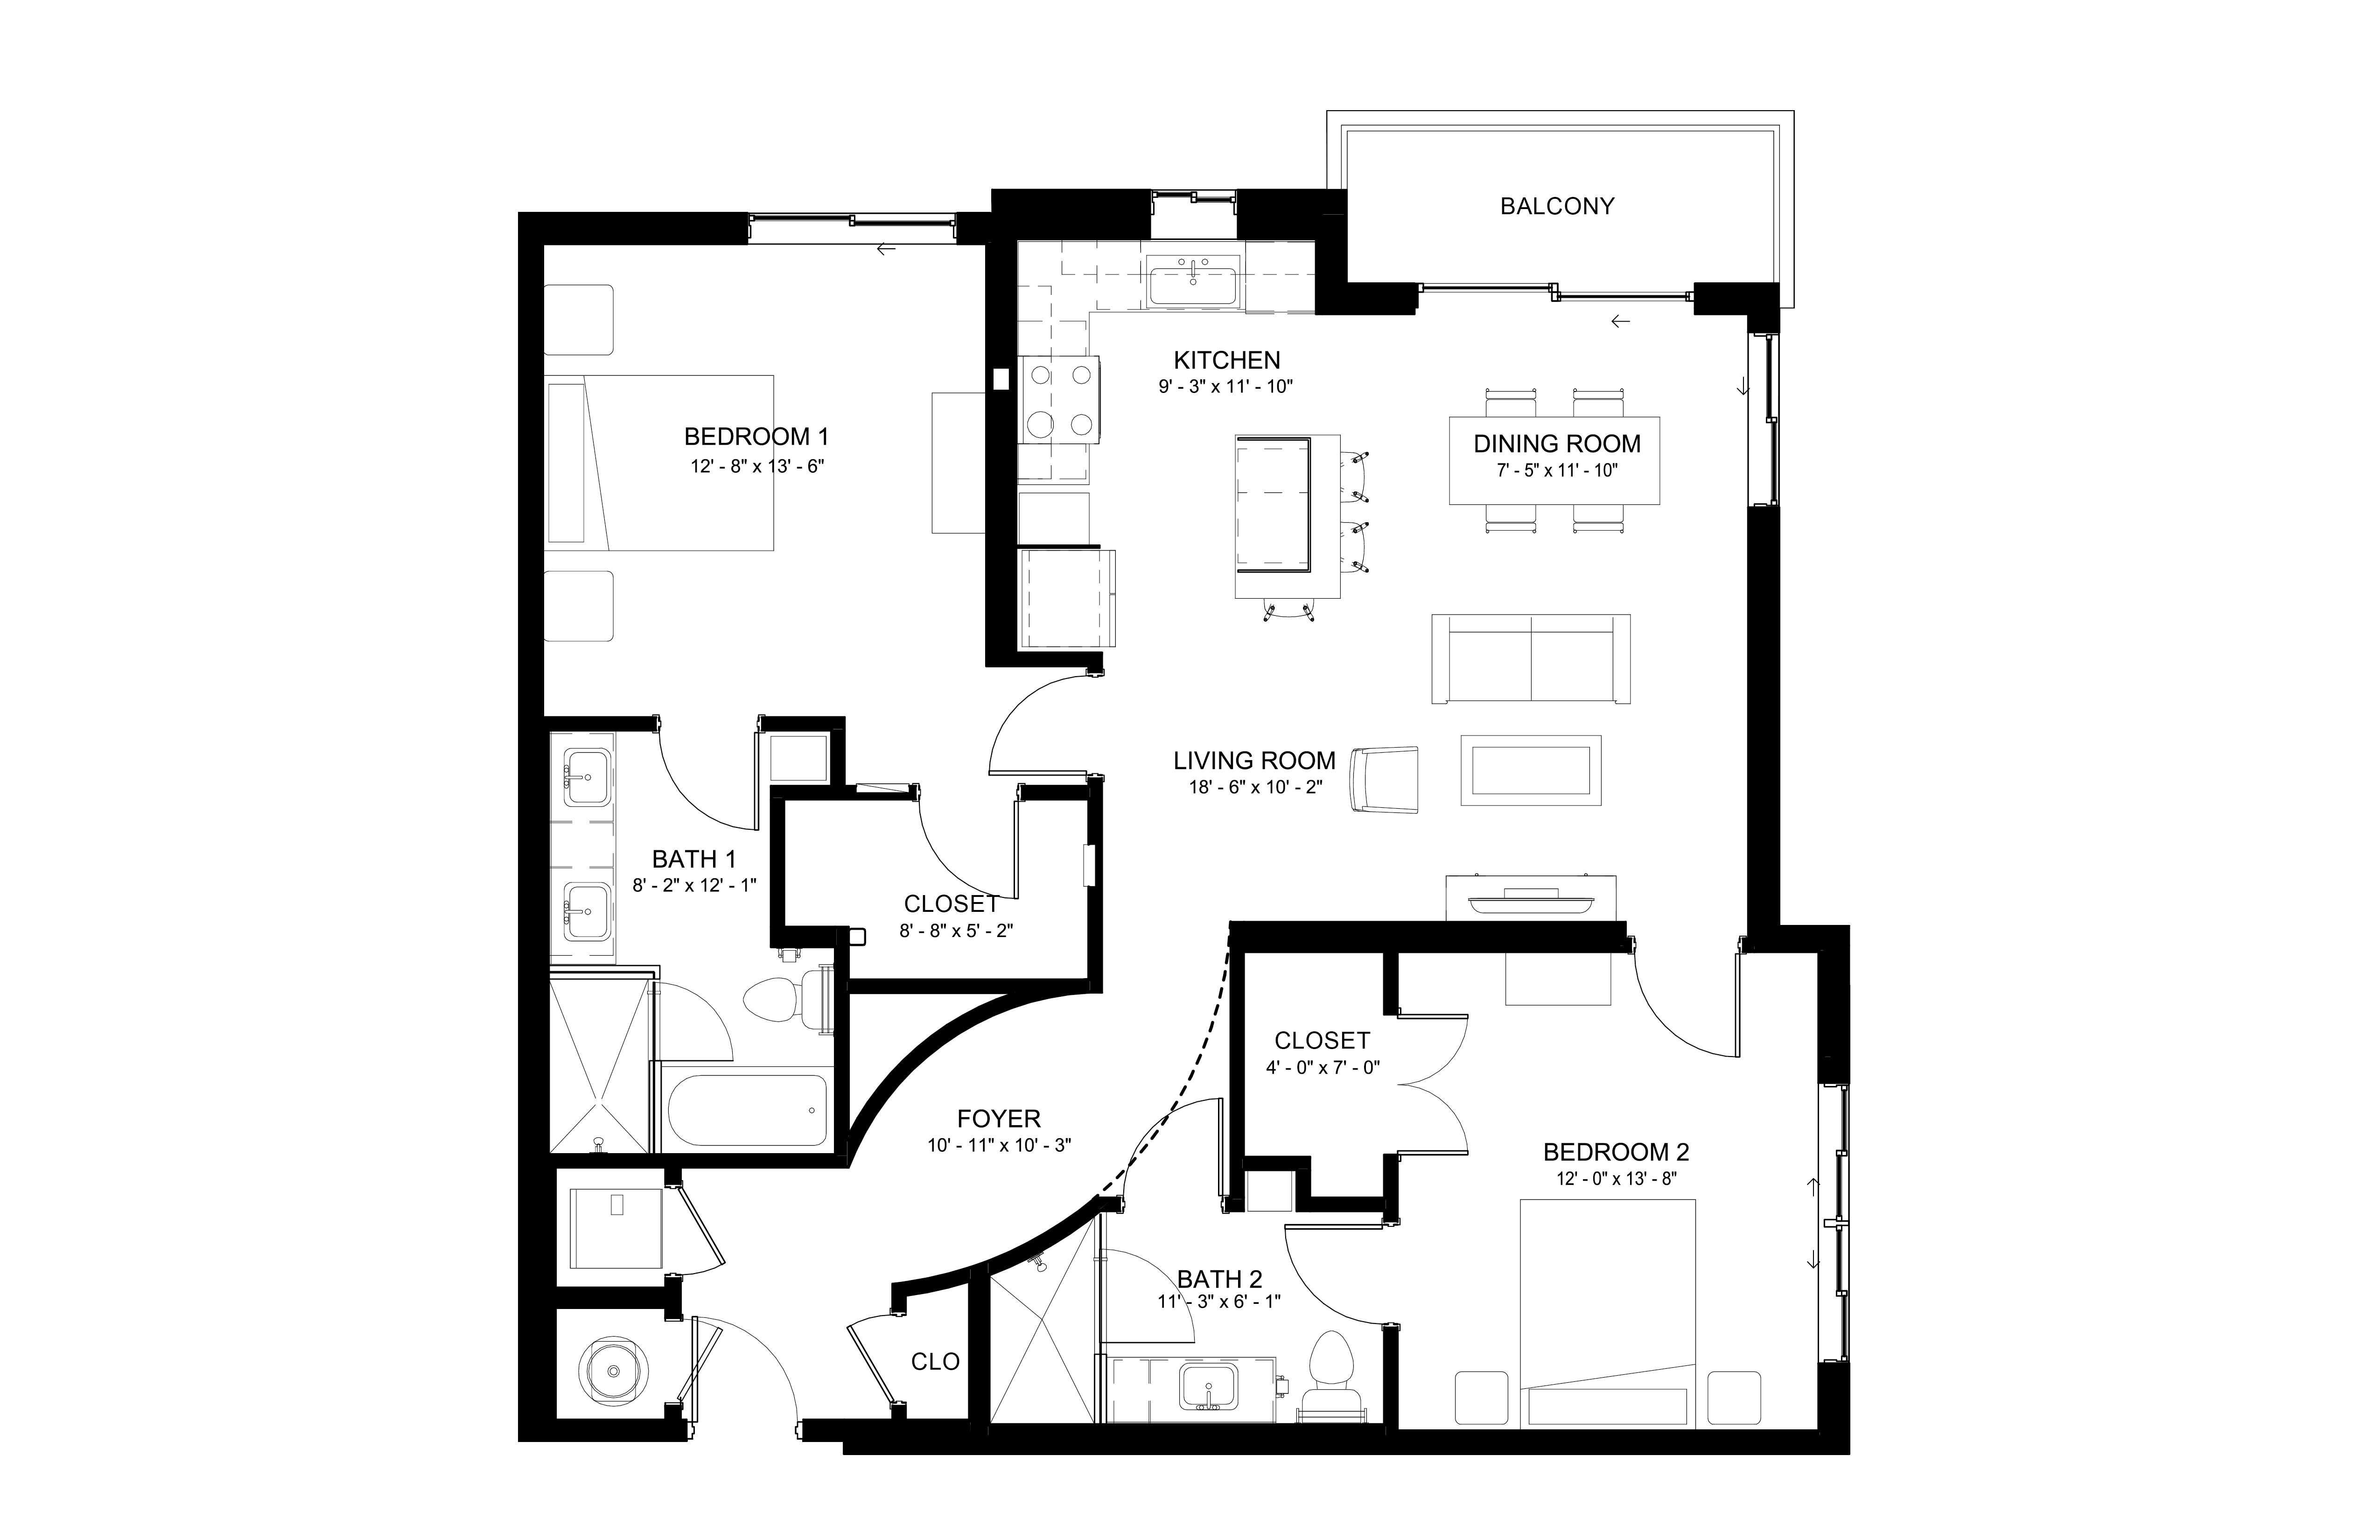 Apartment 112 floorplan